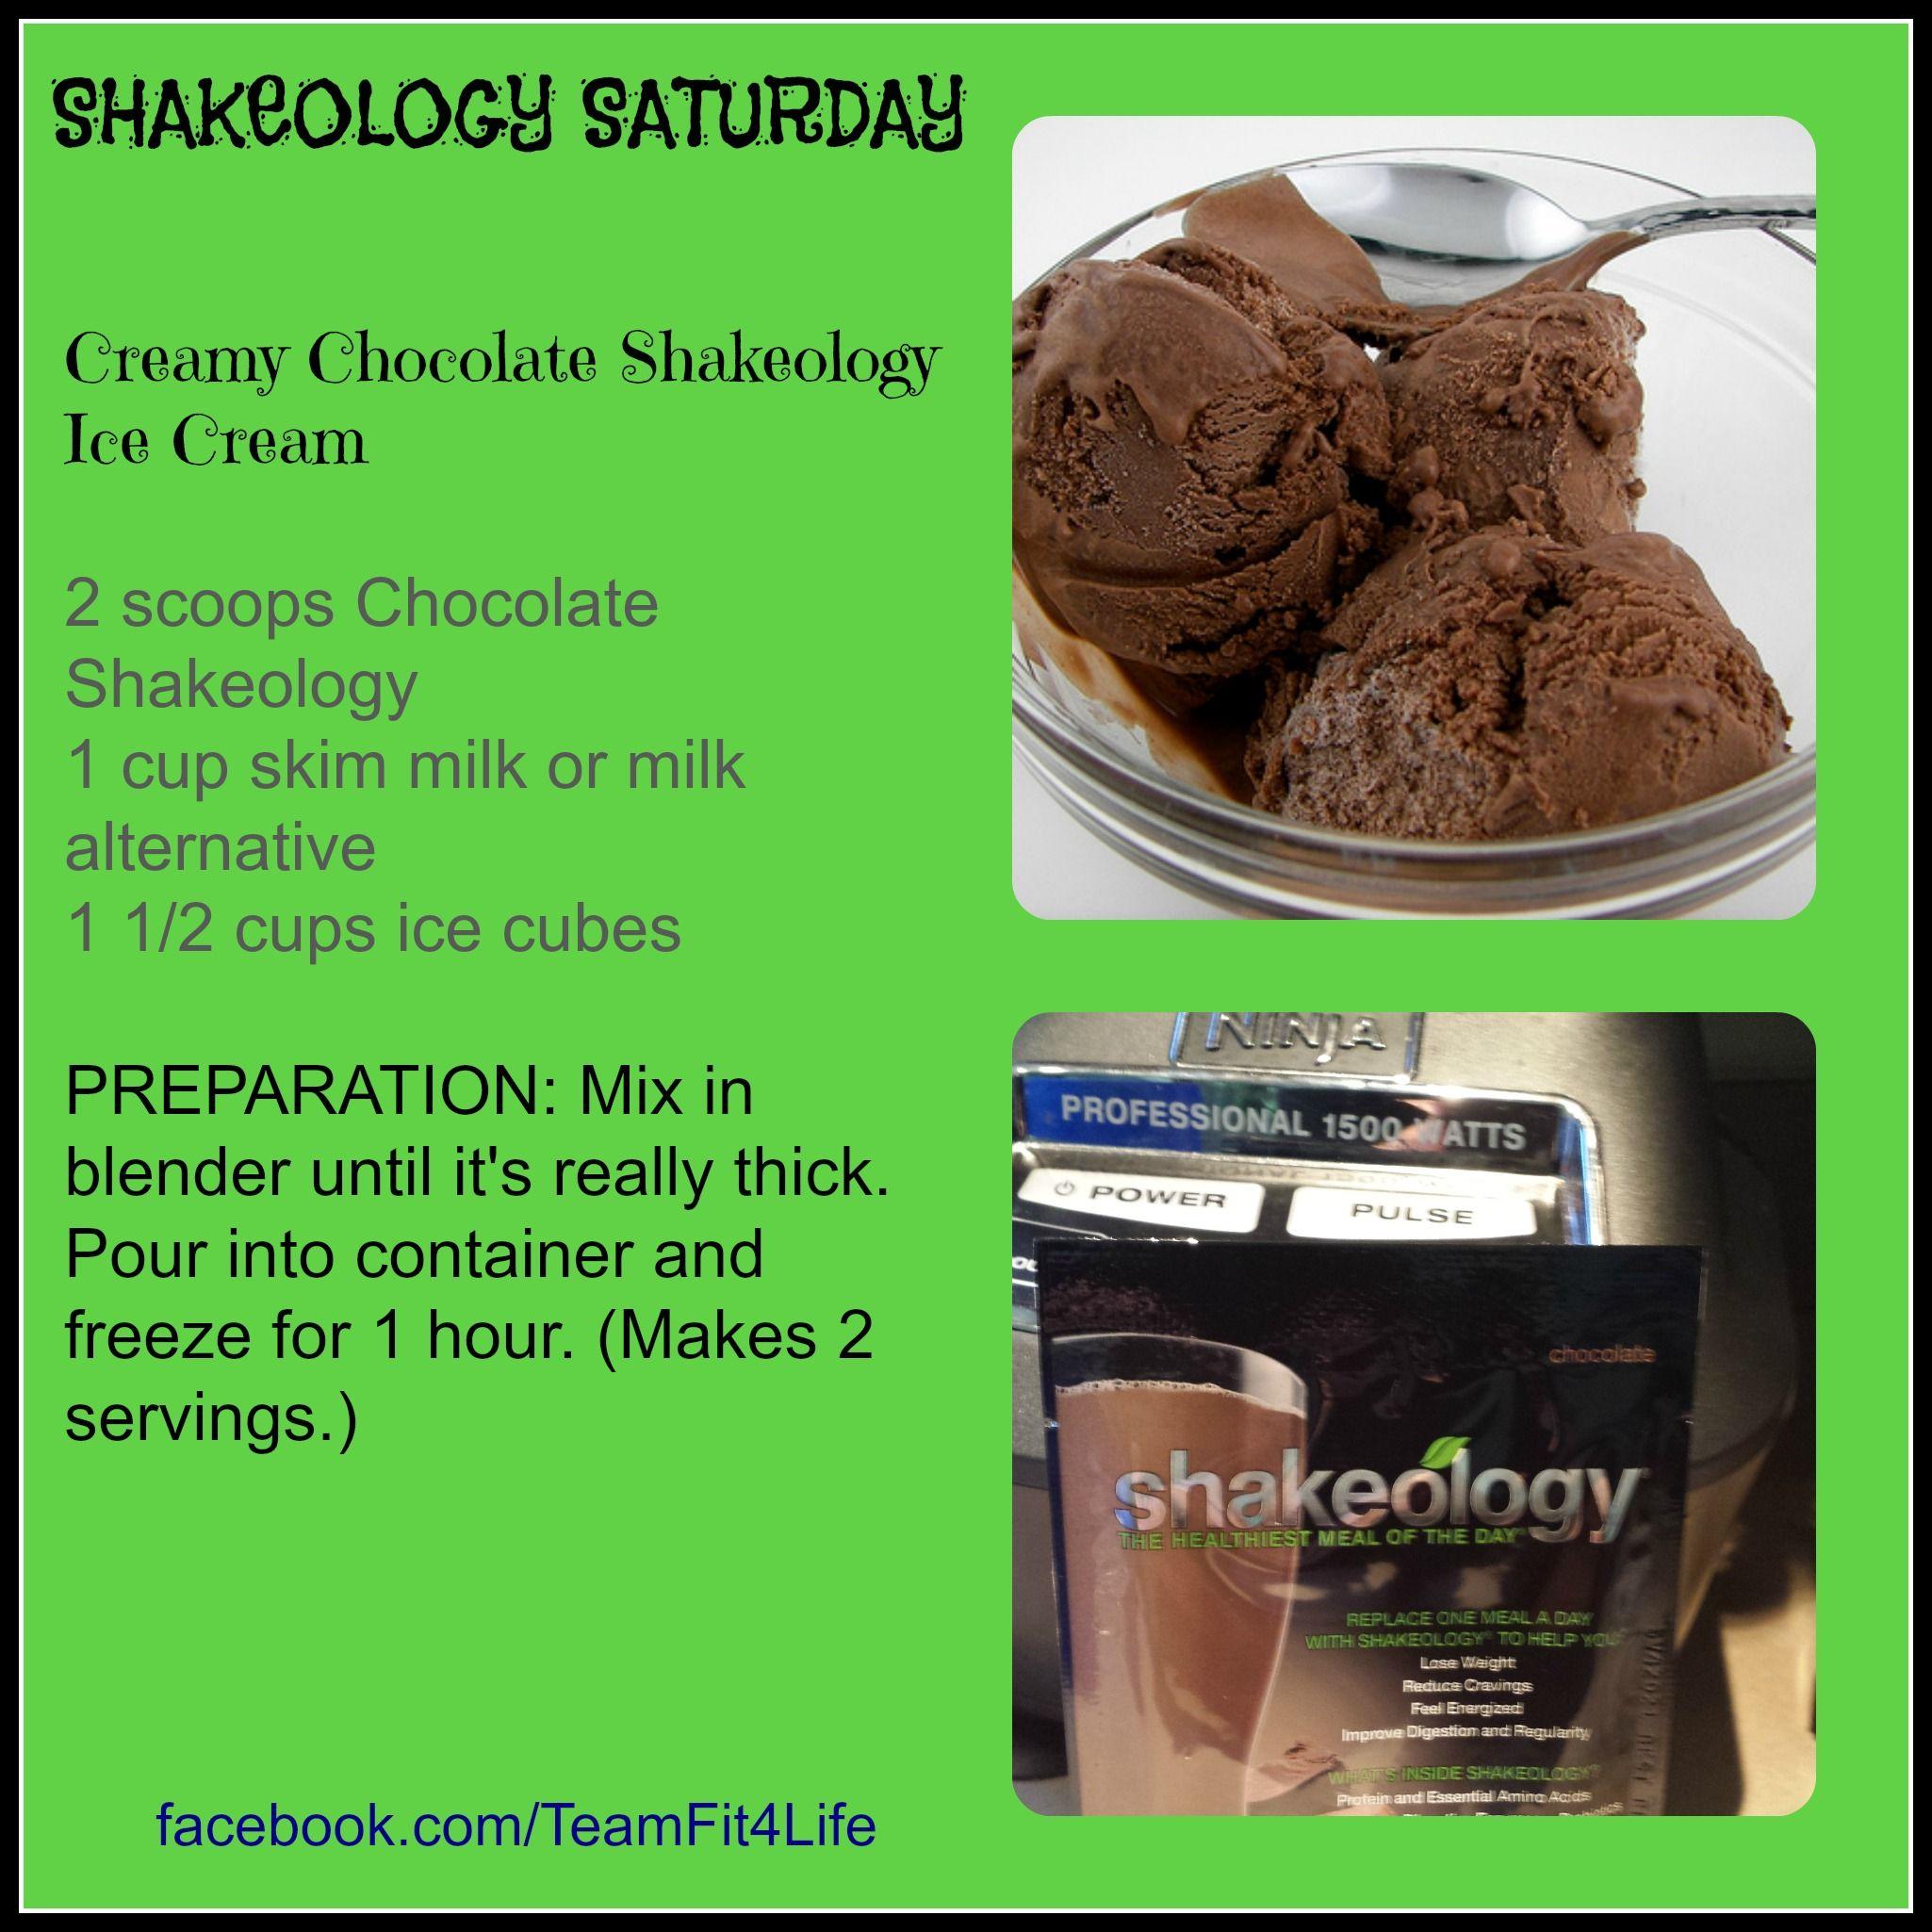 Shakeology Saturday! We even have dessert.... Shakeology